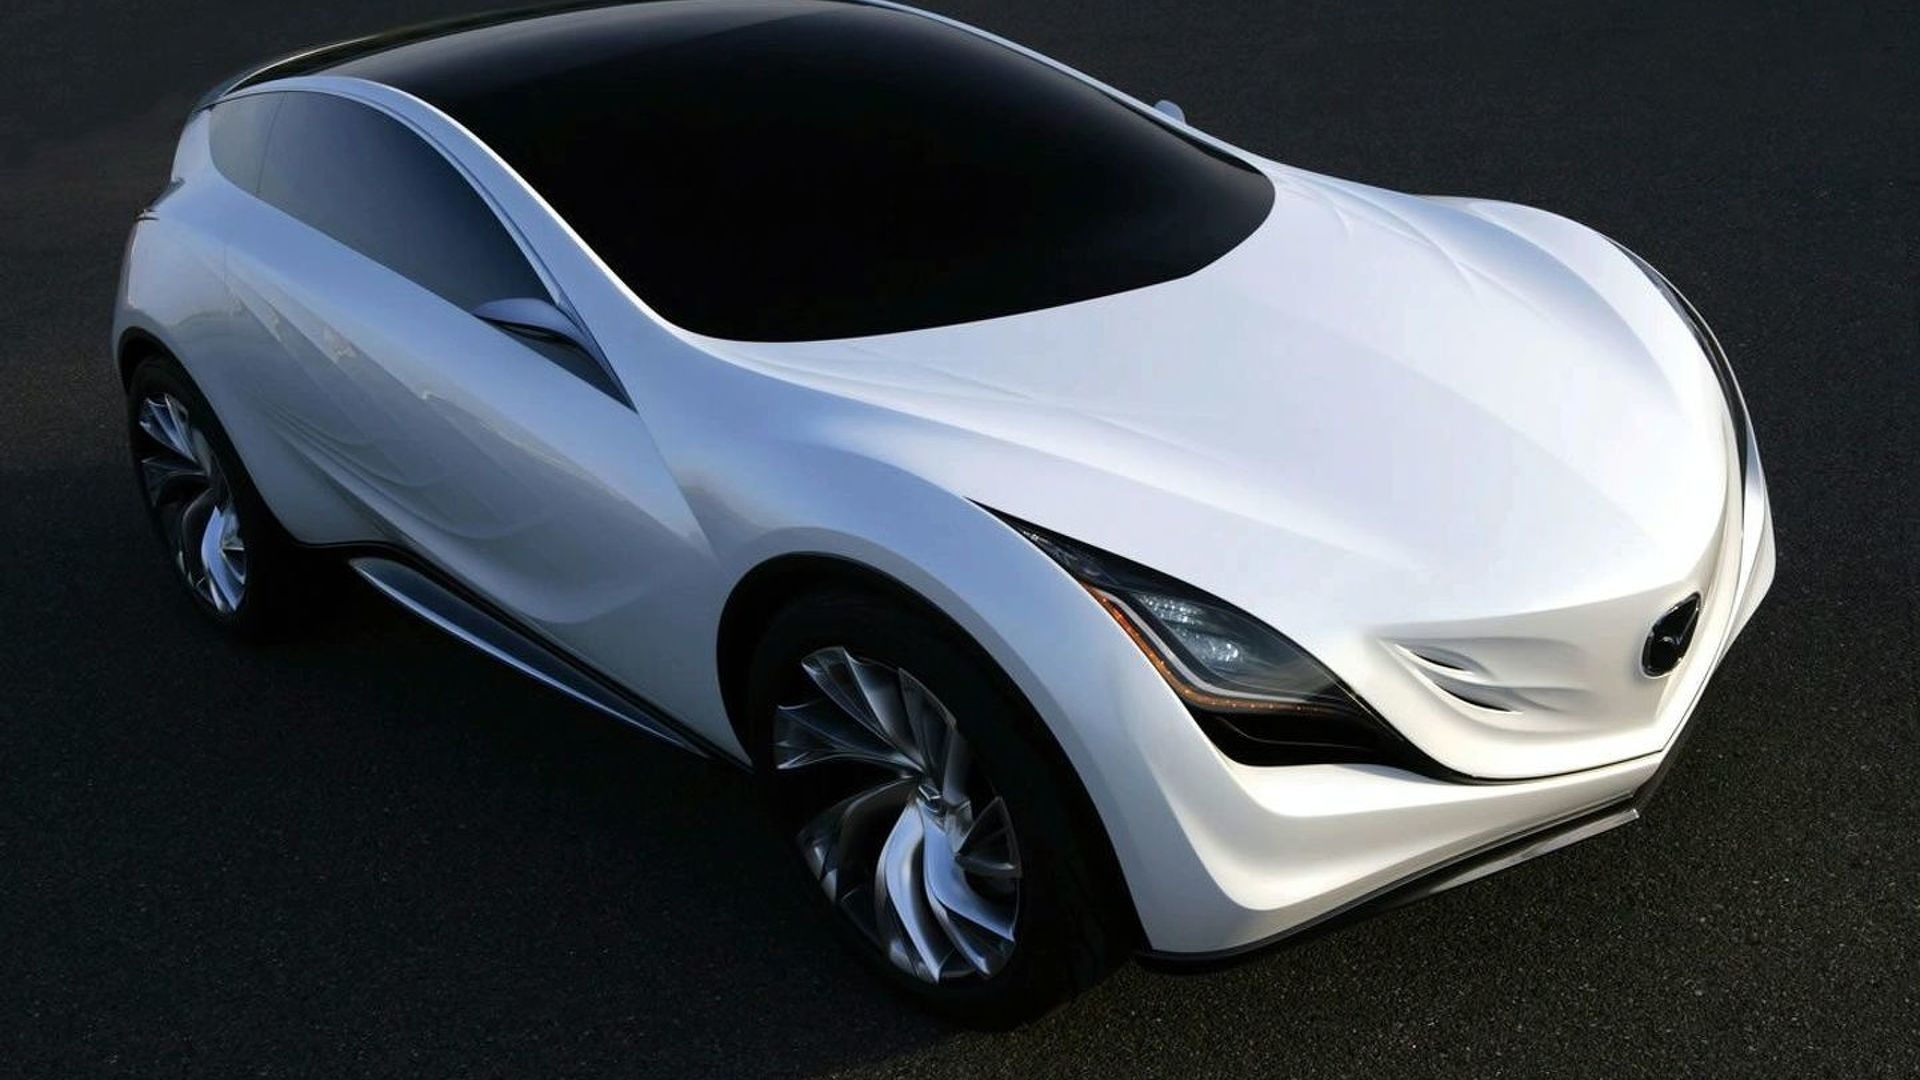 Mazda To Launch Cx 5 Small Suv Based On 2008 Kazamai Concept